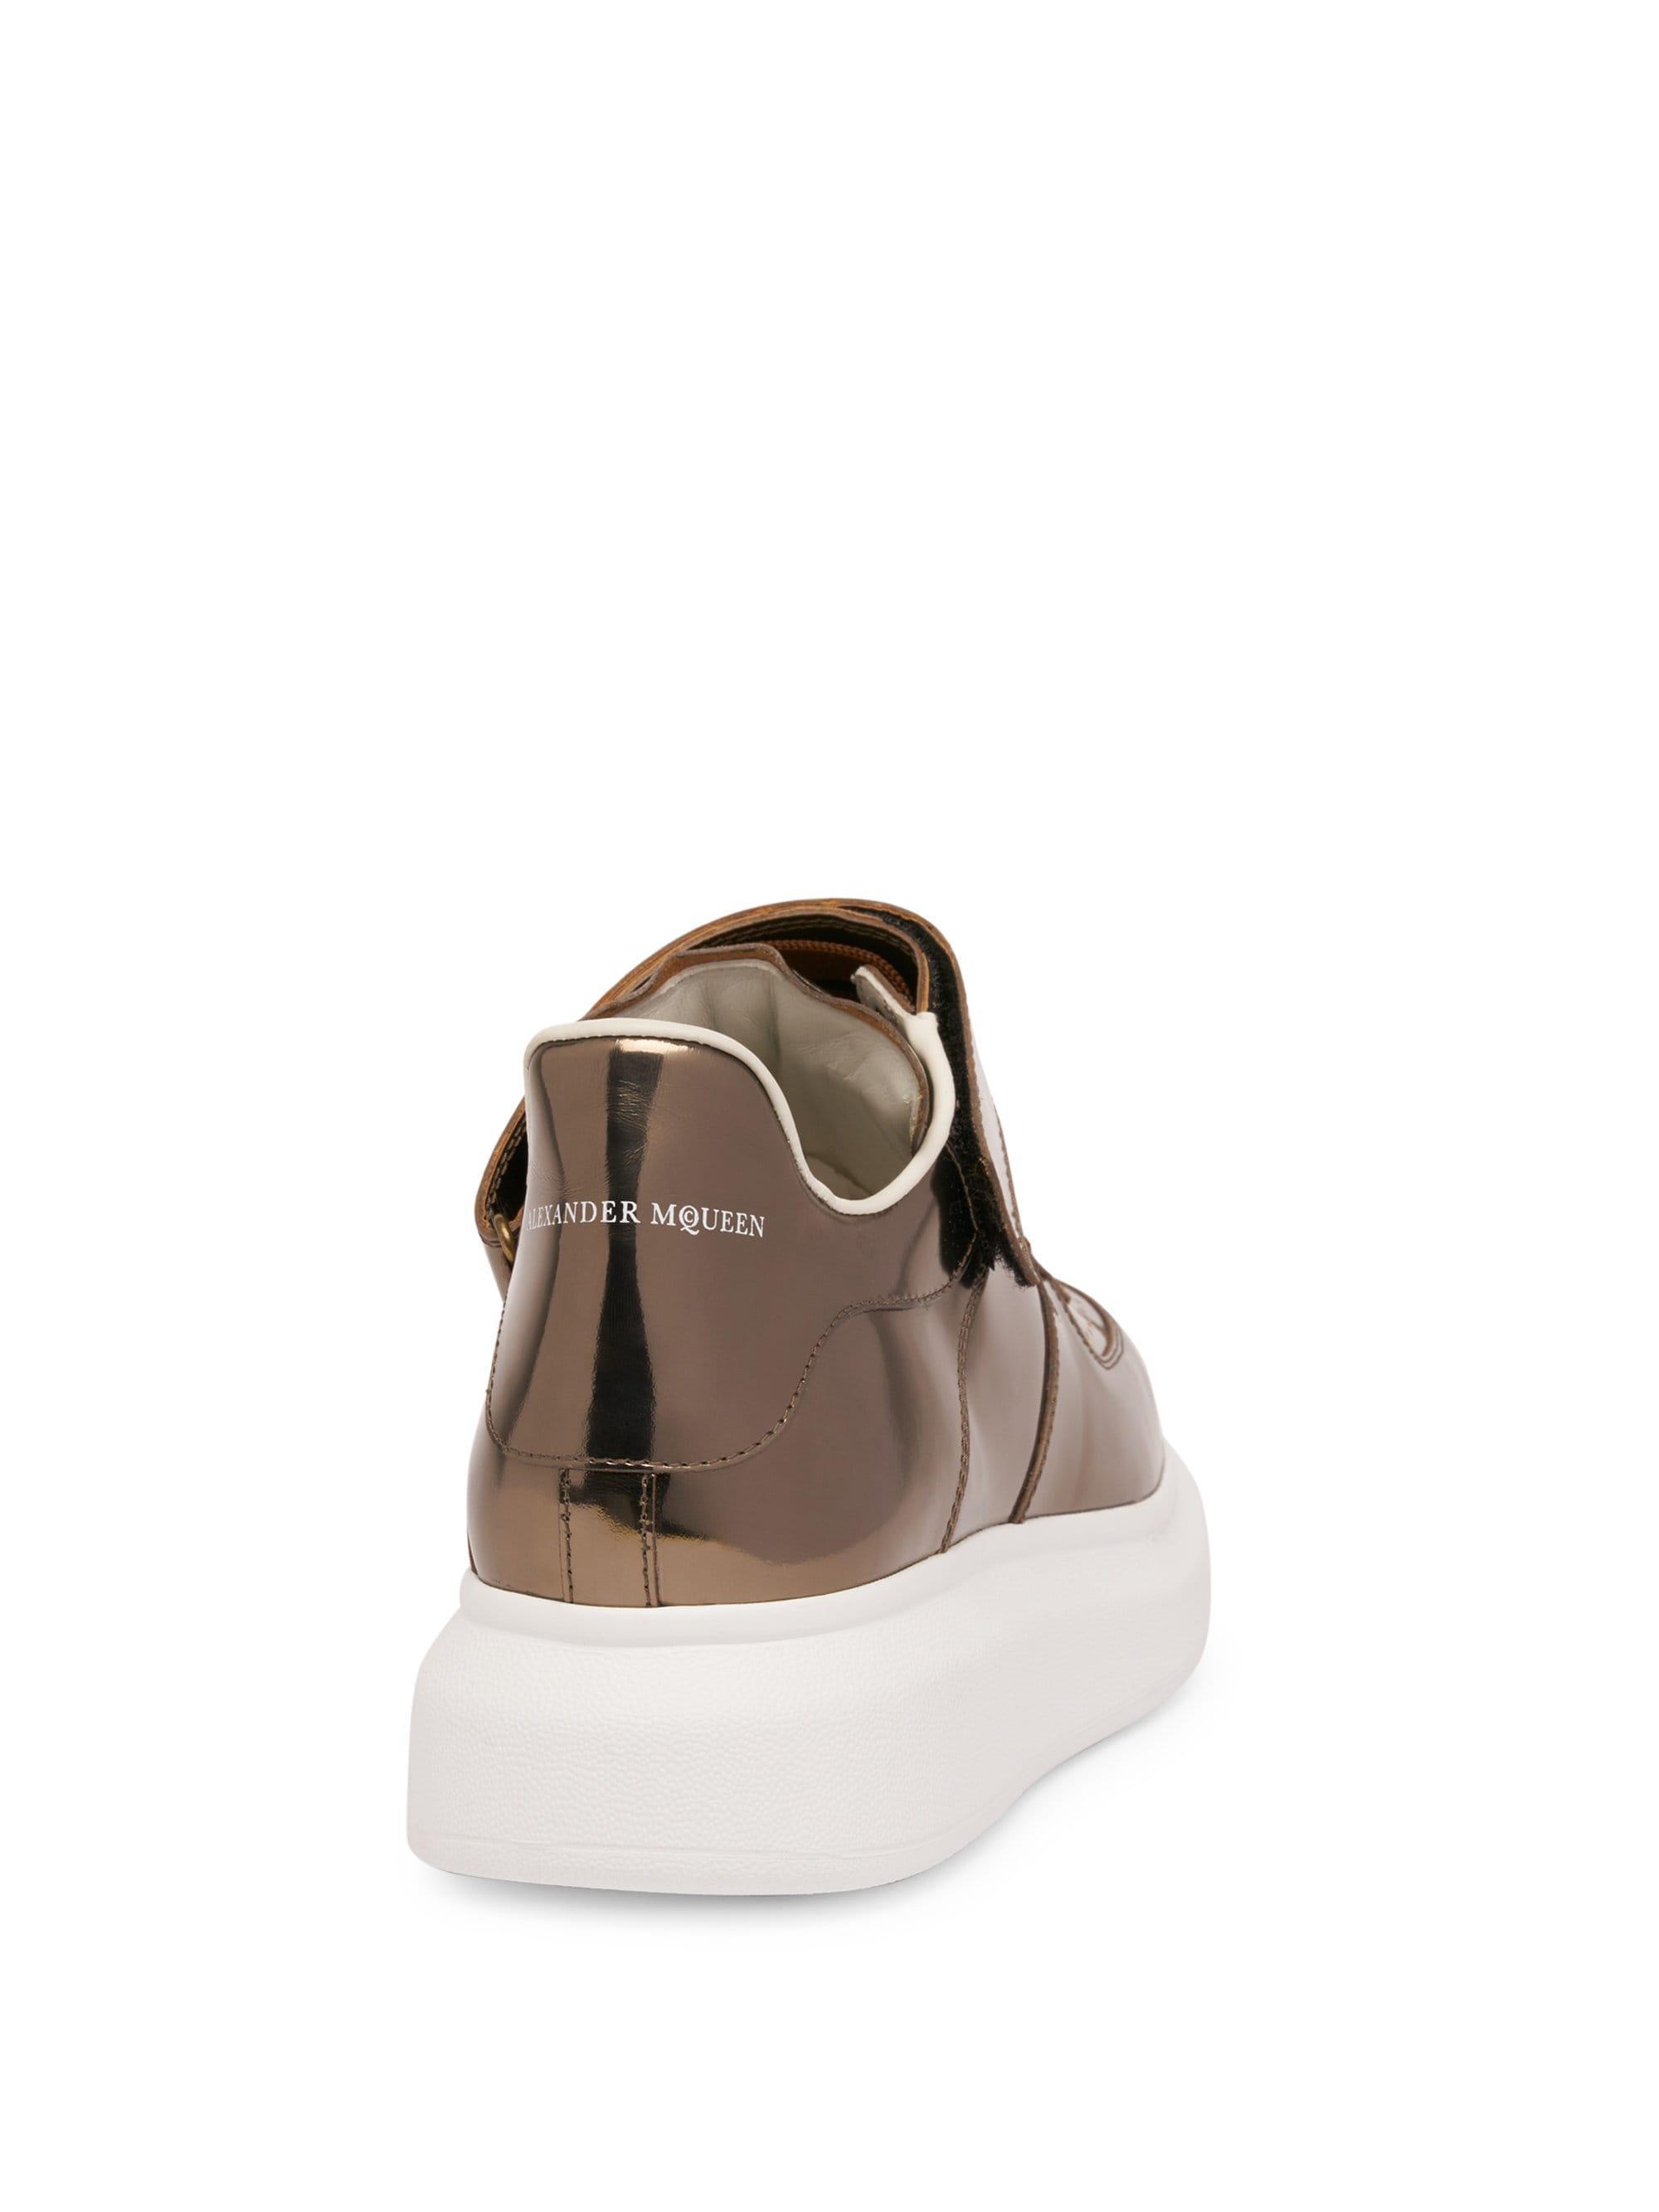 5997e9706b Alexander McQueen Men's Ankle Strap Leather Platform Sneakers ...